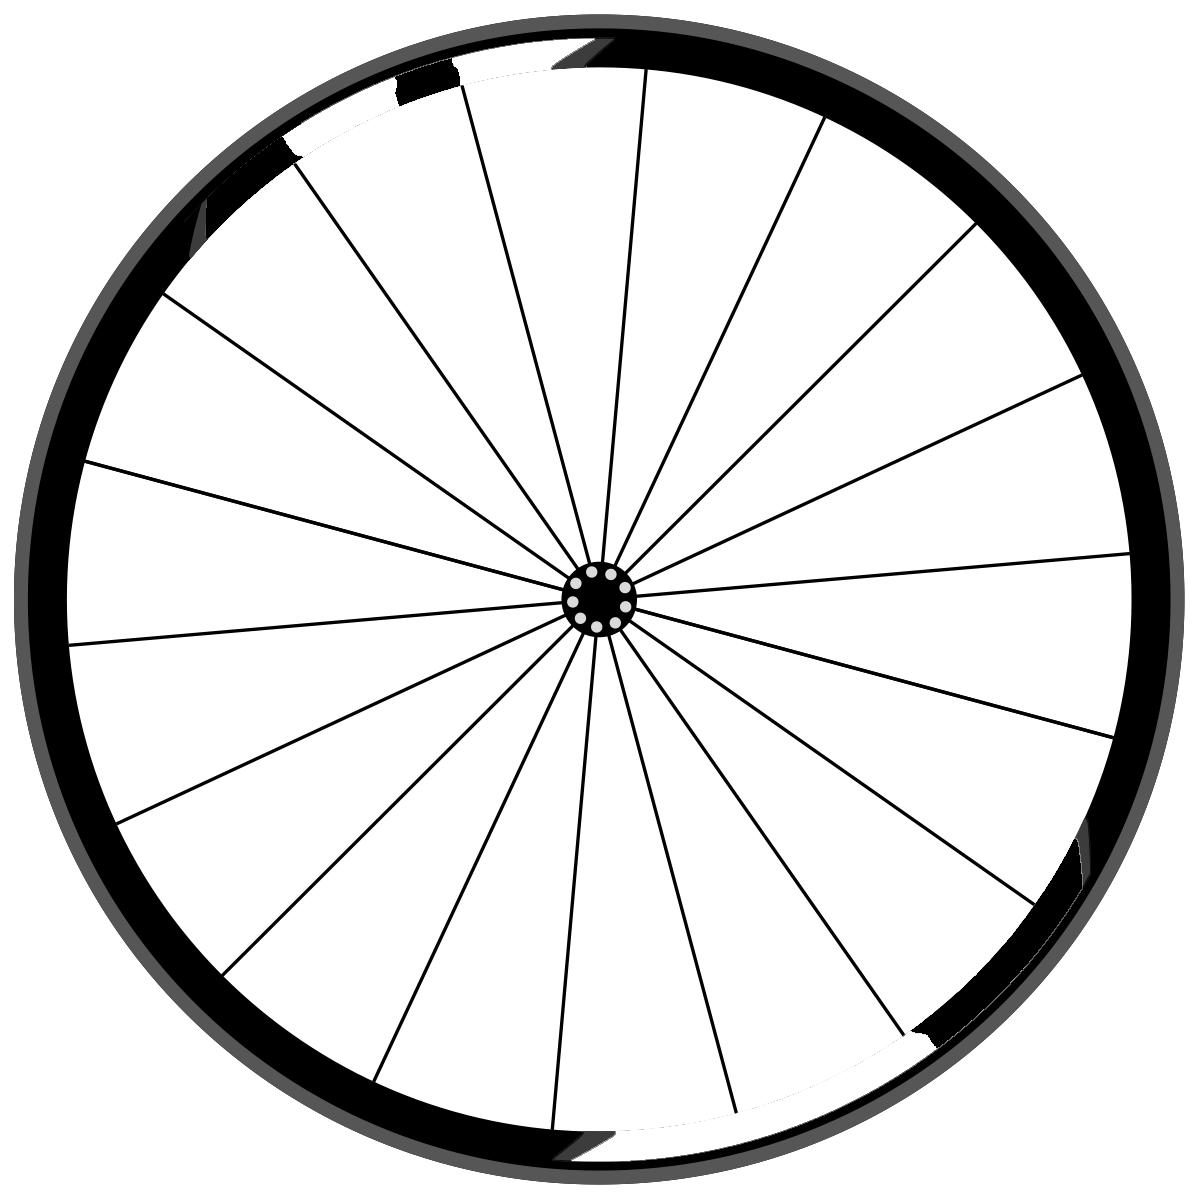 Profilbike XC16 design personnalisé